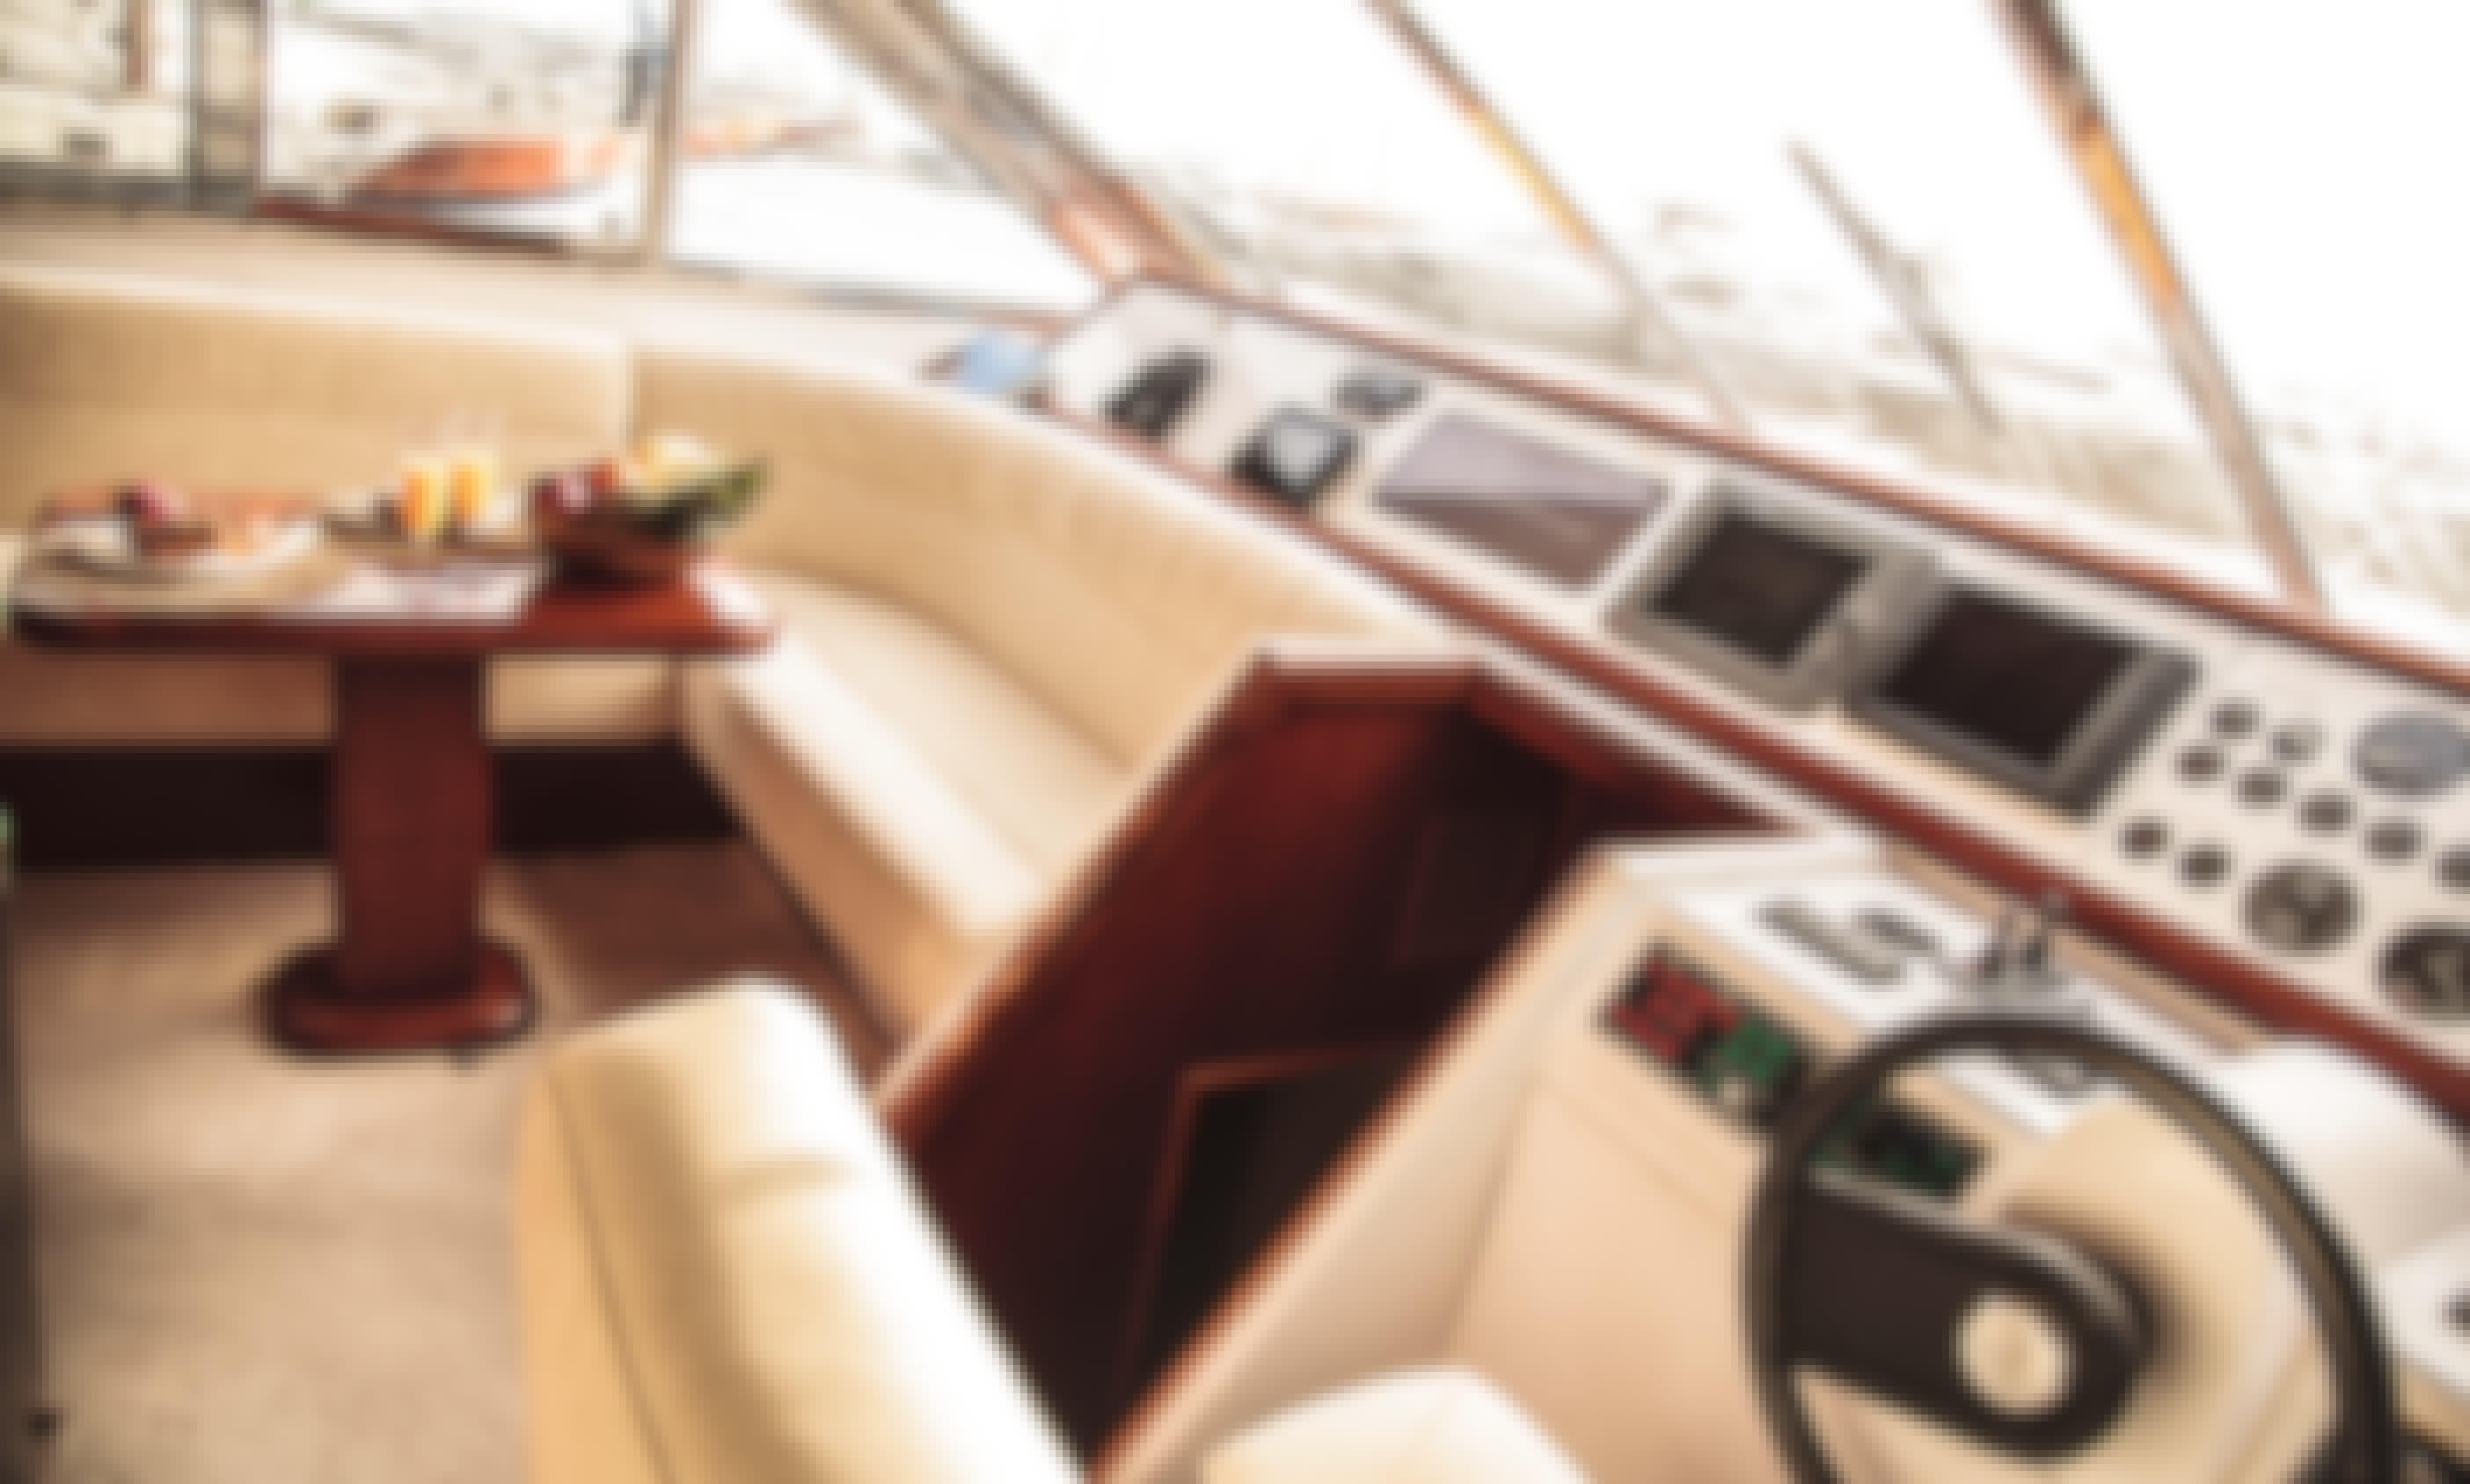 Technema 64 Flybridge Power Mega Yacht in Athens, Greece